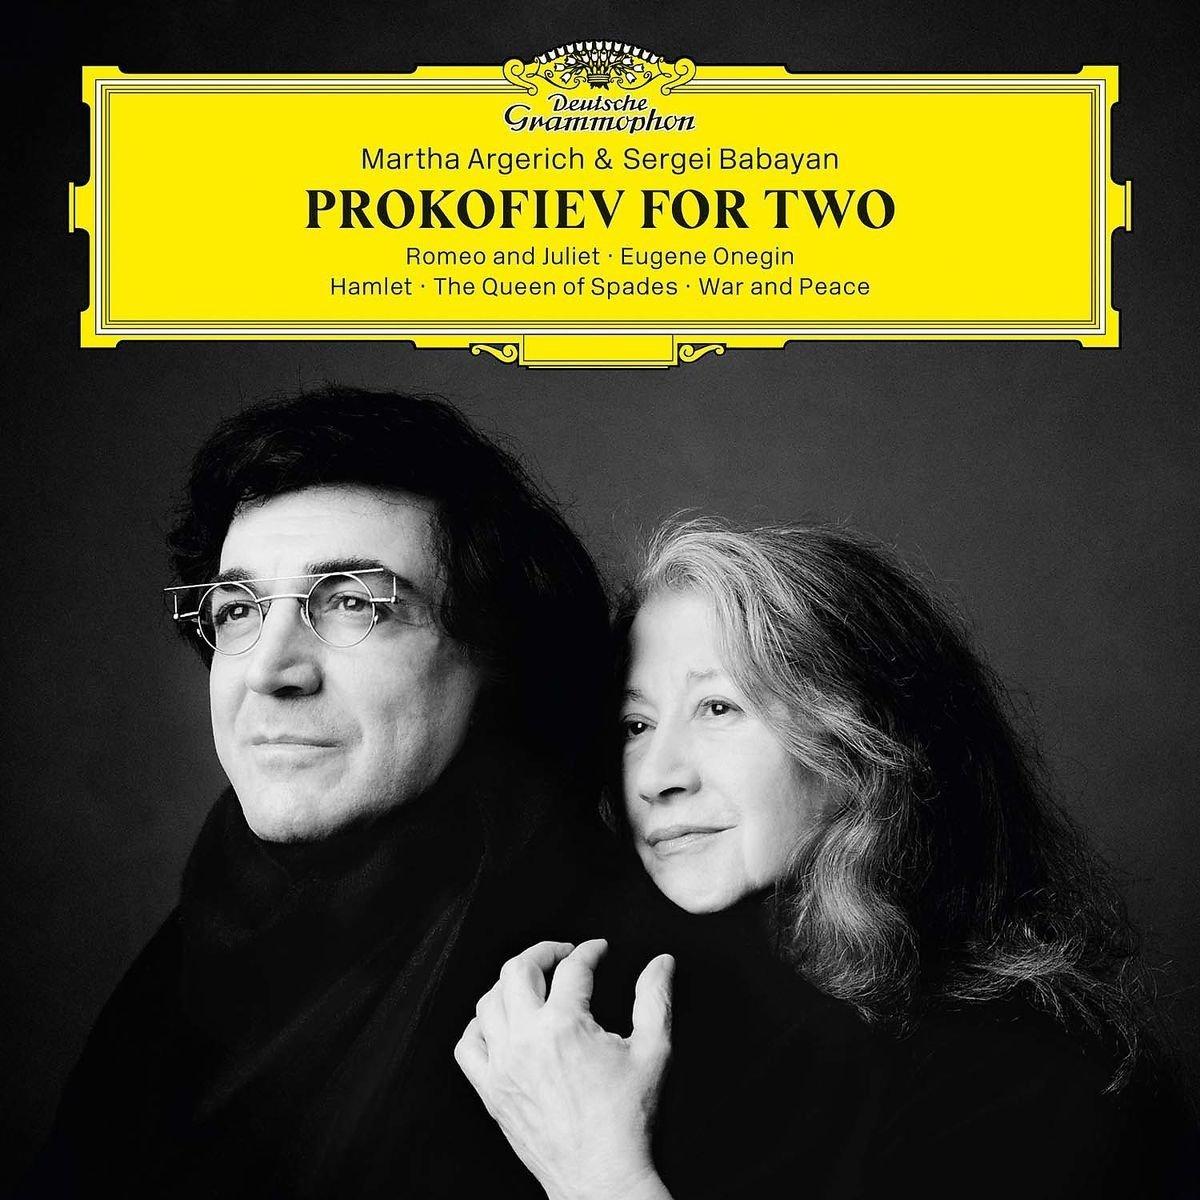 Vinilo : Martha Argerich/Sergei Babayan - Prokofiev For Two (2PC)